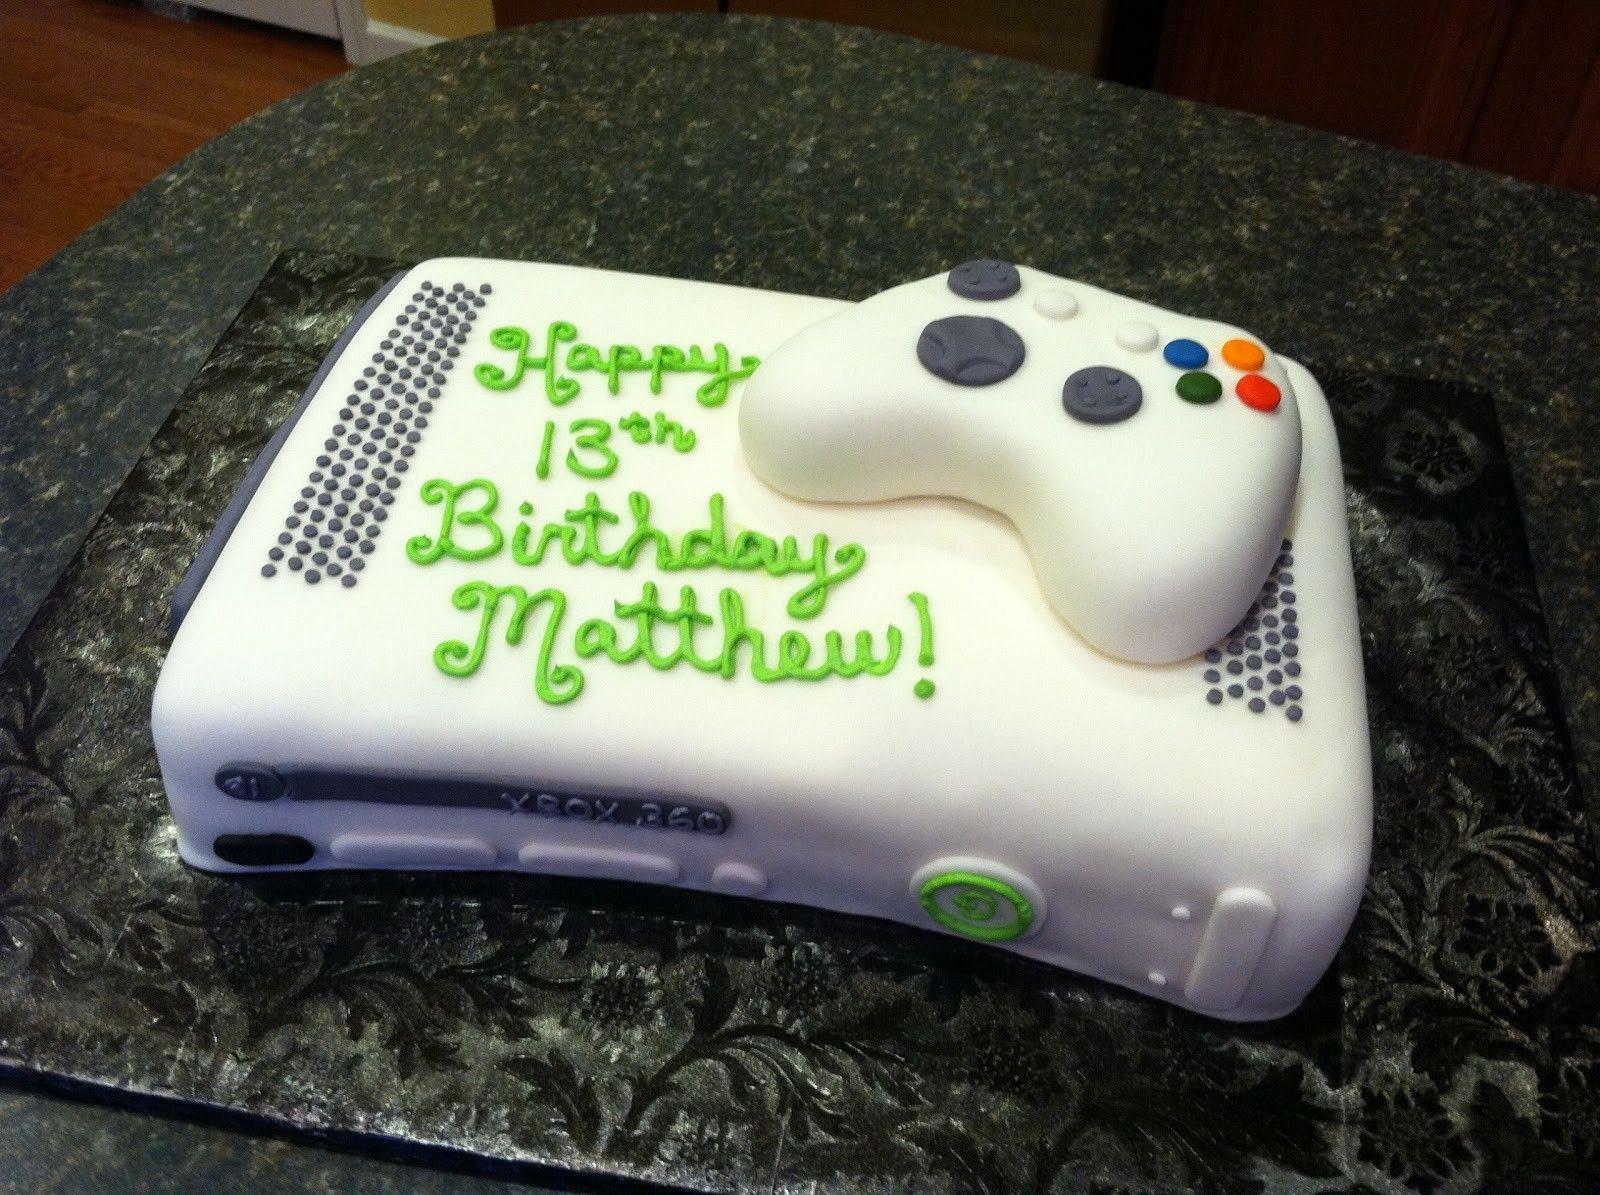 Pin By Bobbi Jo Simons On Birthday Ideas Pinterest Video Game - Video game birthday cake